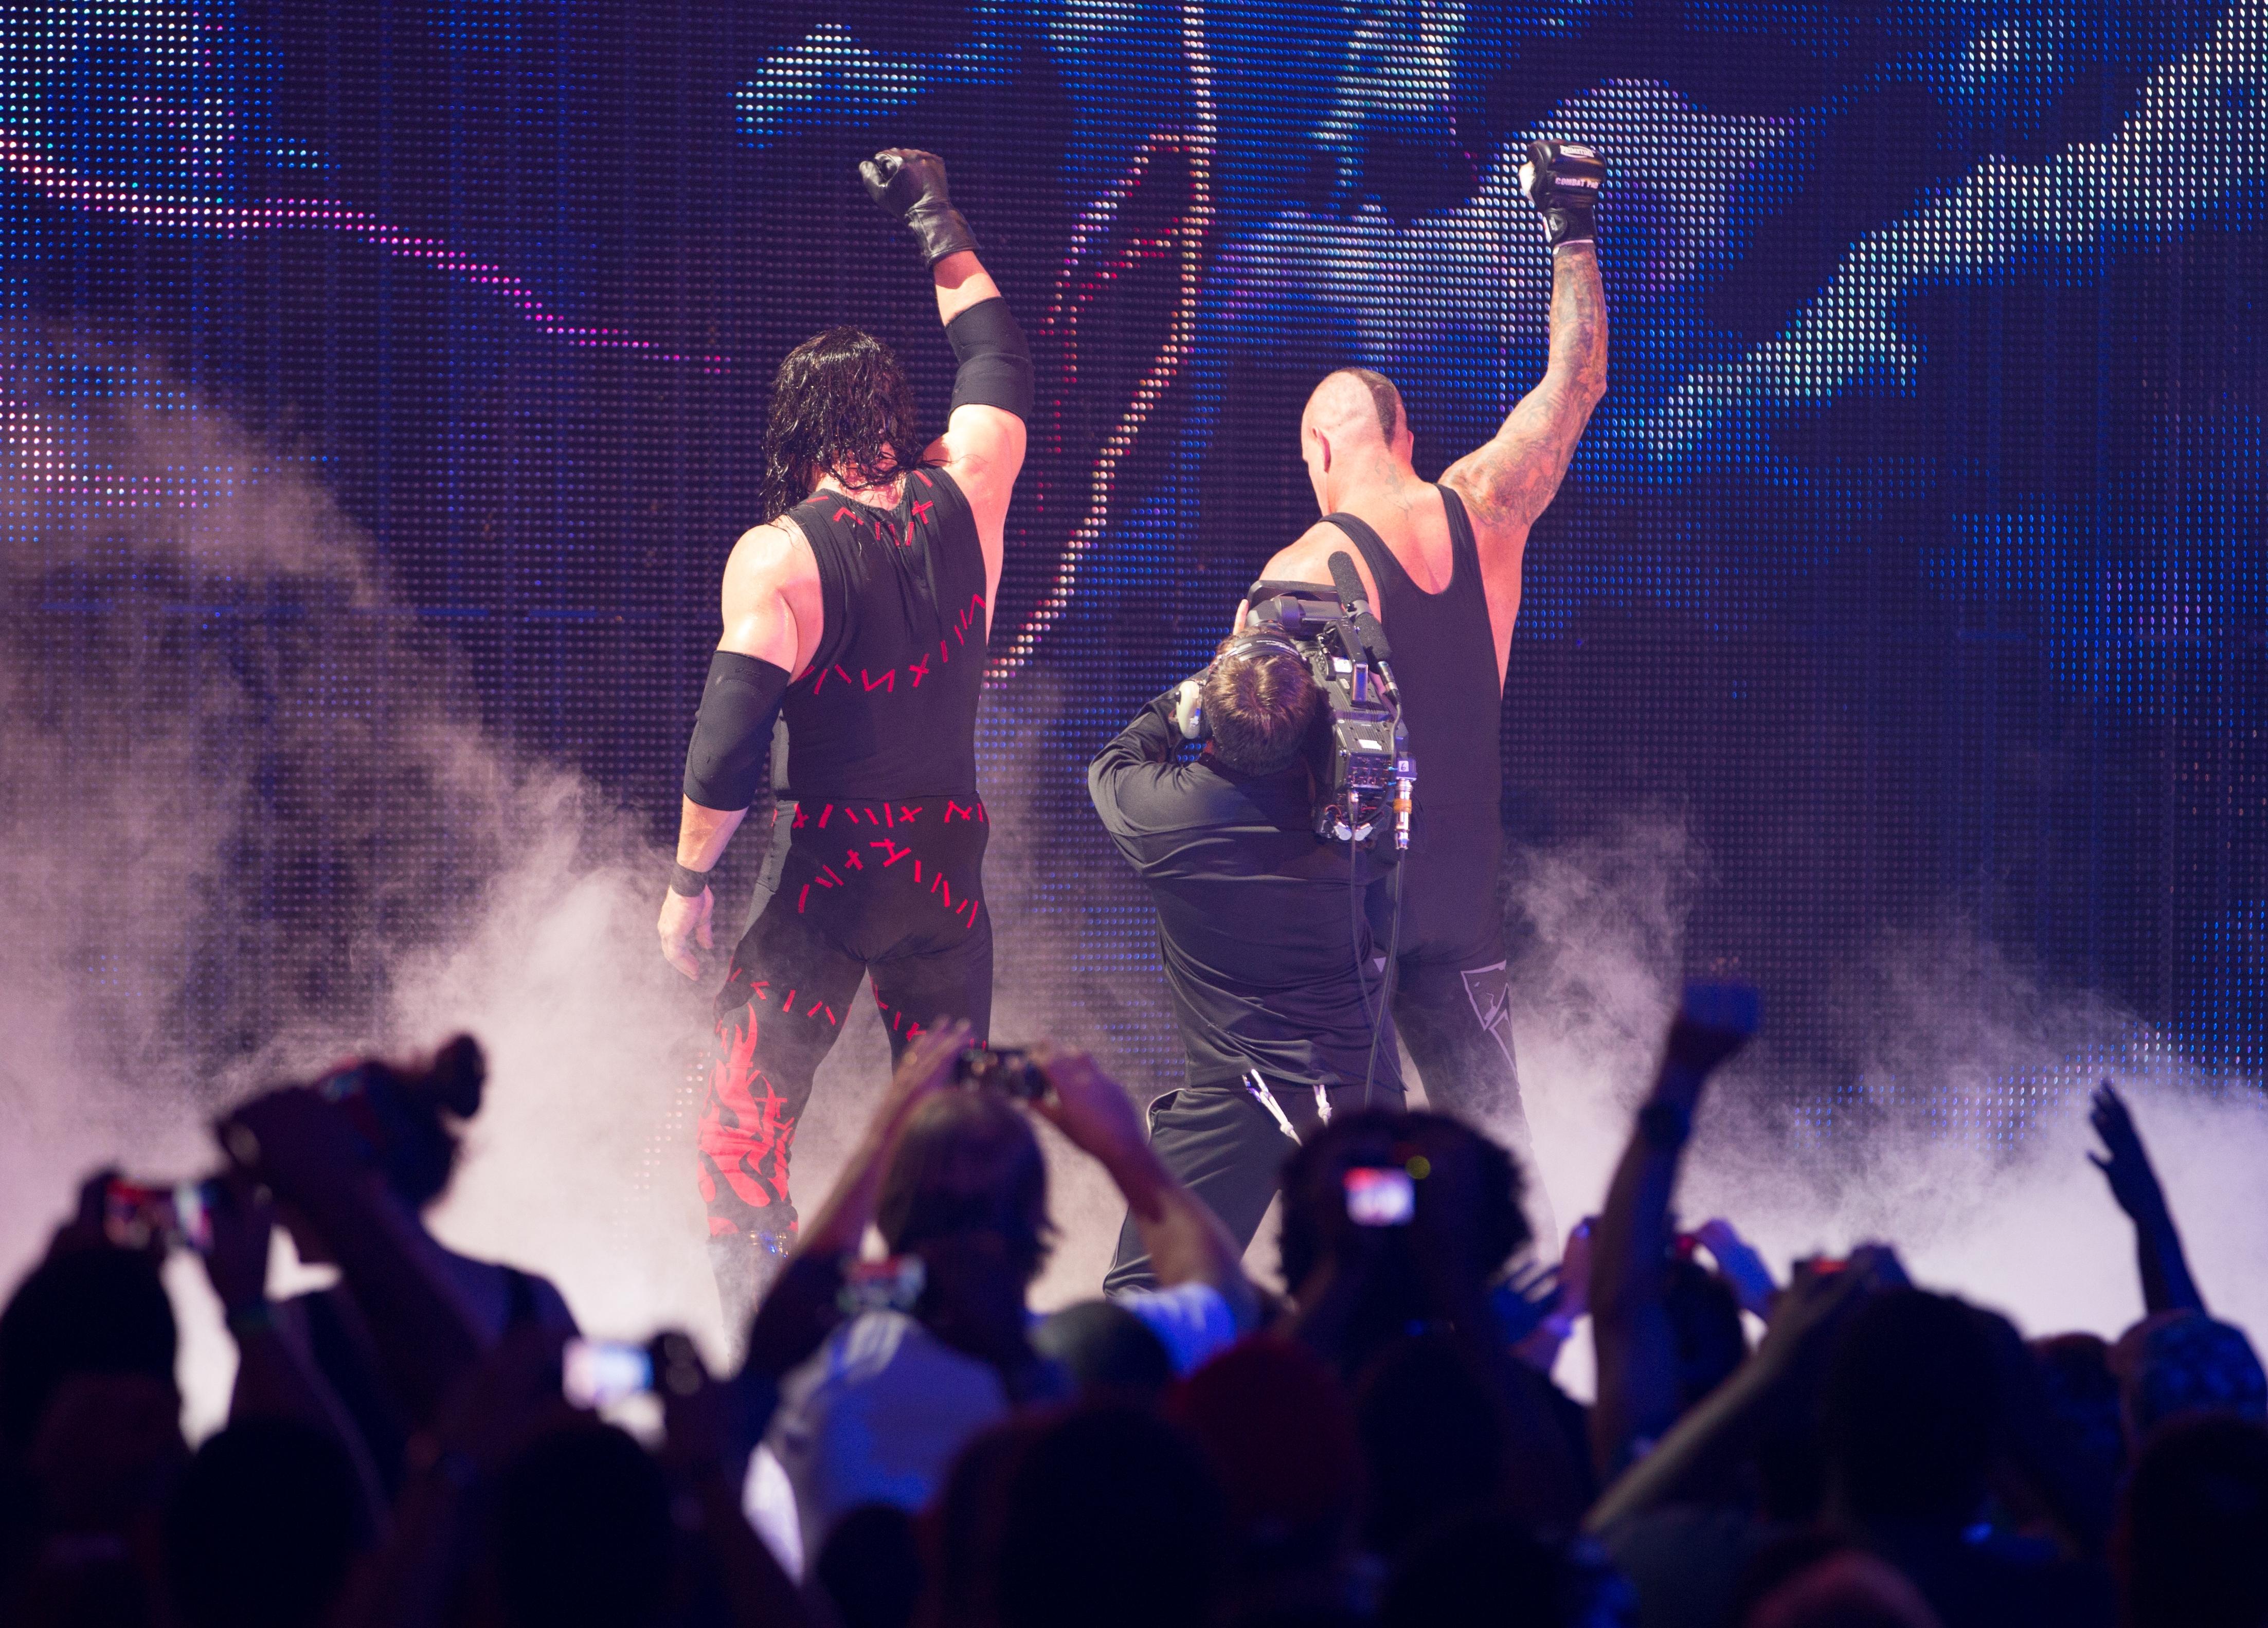 Kronik vs Brothers of Destruction The Brothers of Destruction